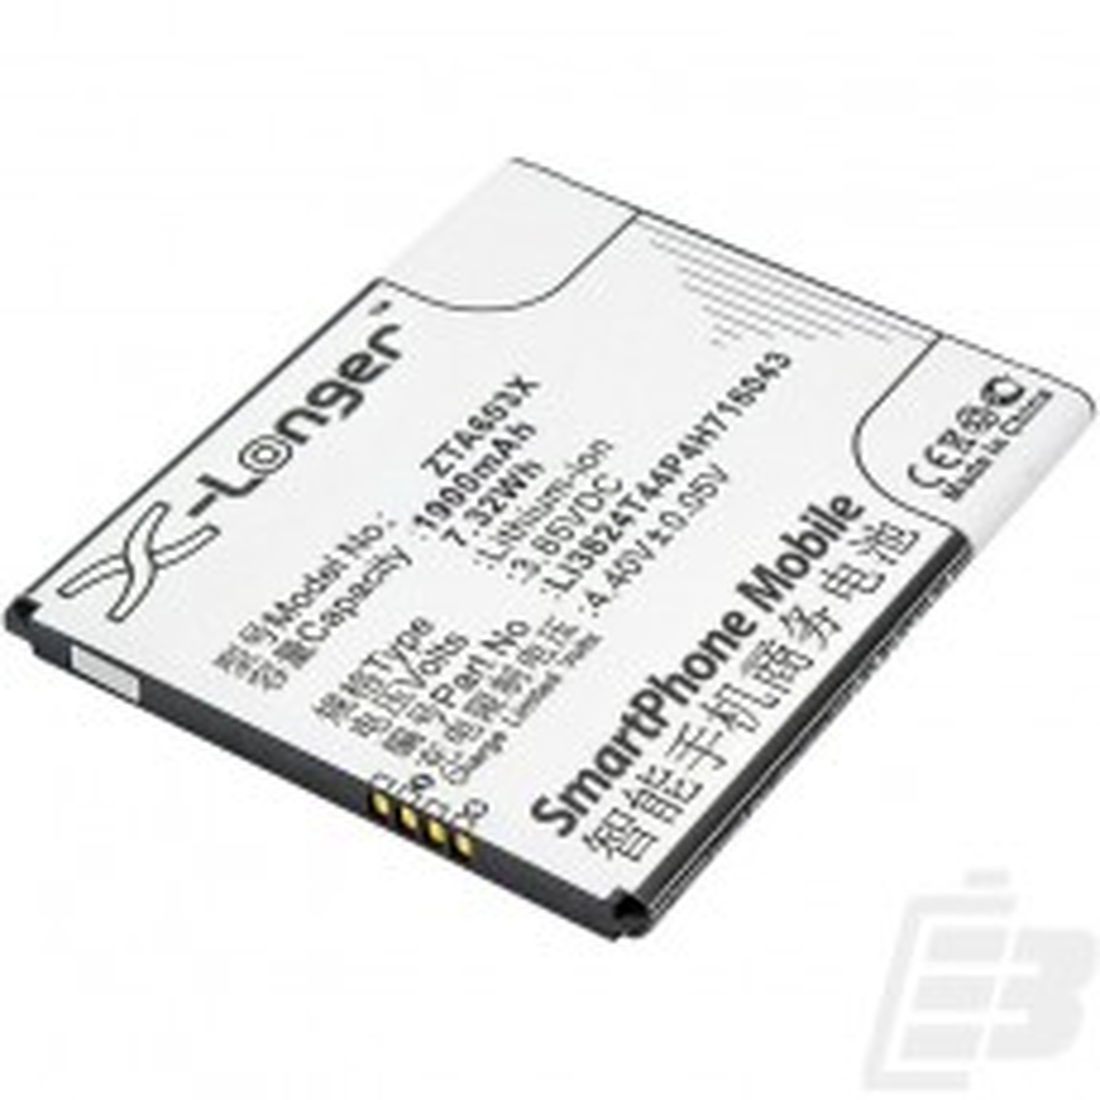 Smartphone battery ZTE Blade A520_1